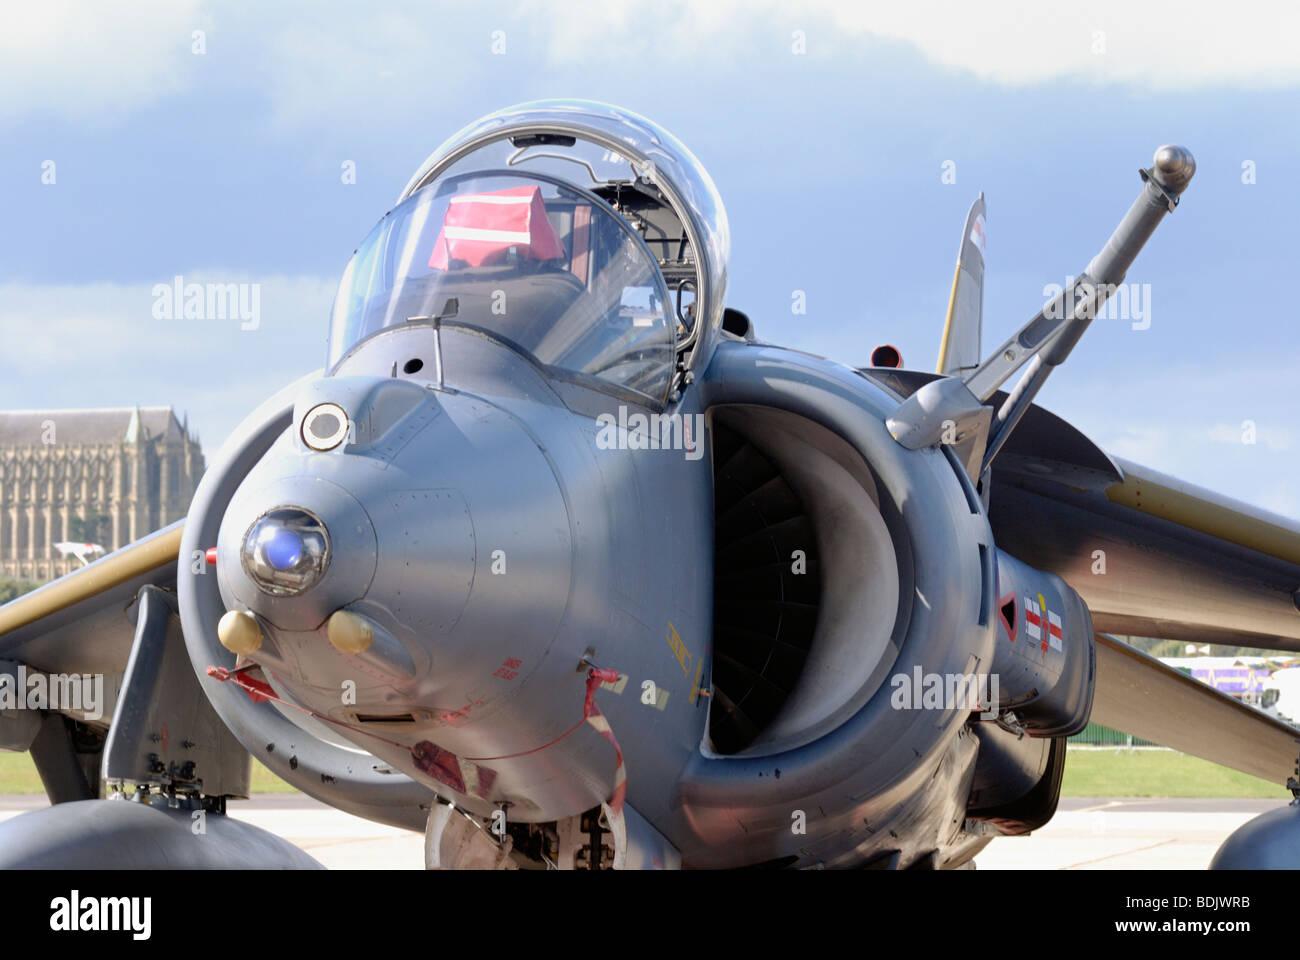 A British Aerospace Harrier GR7 Cockpit - Stock Image